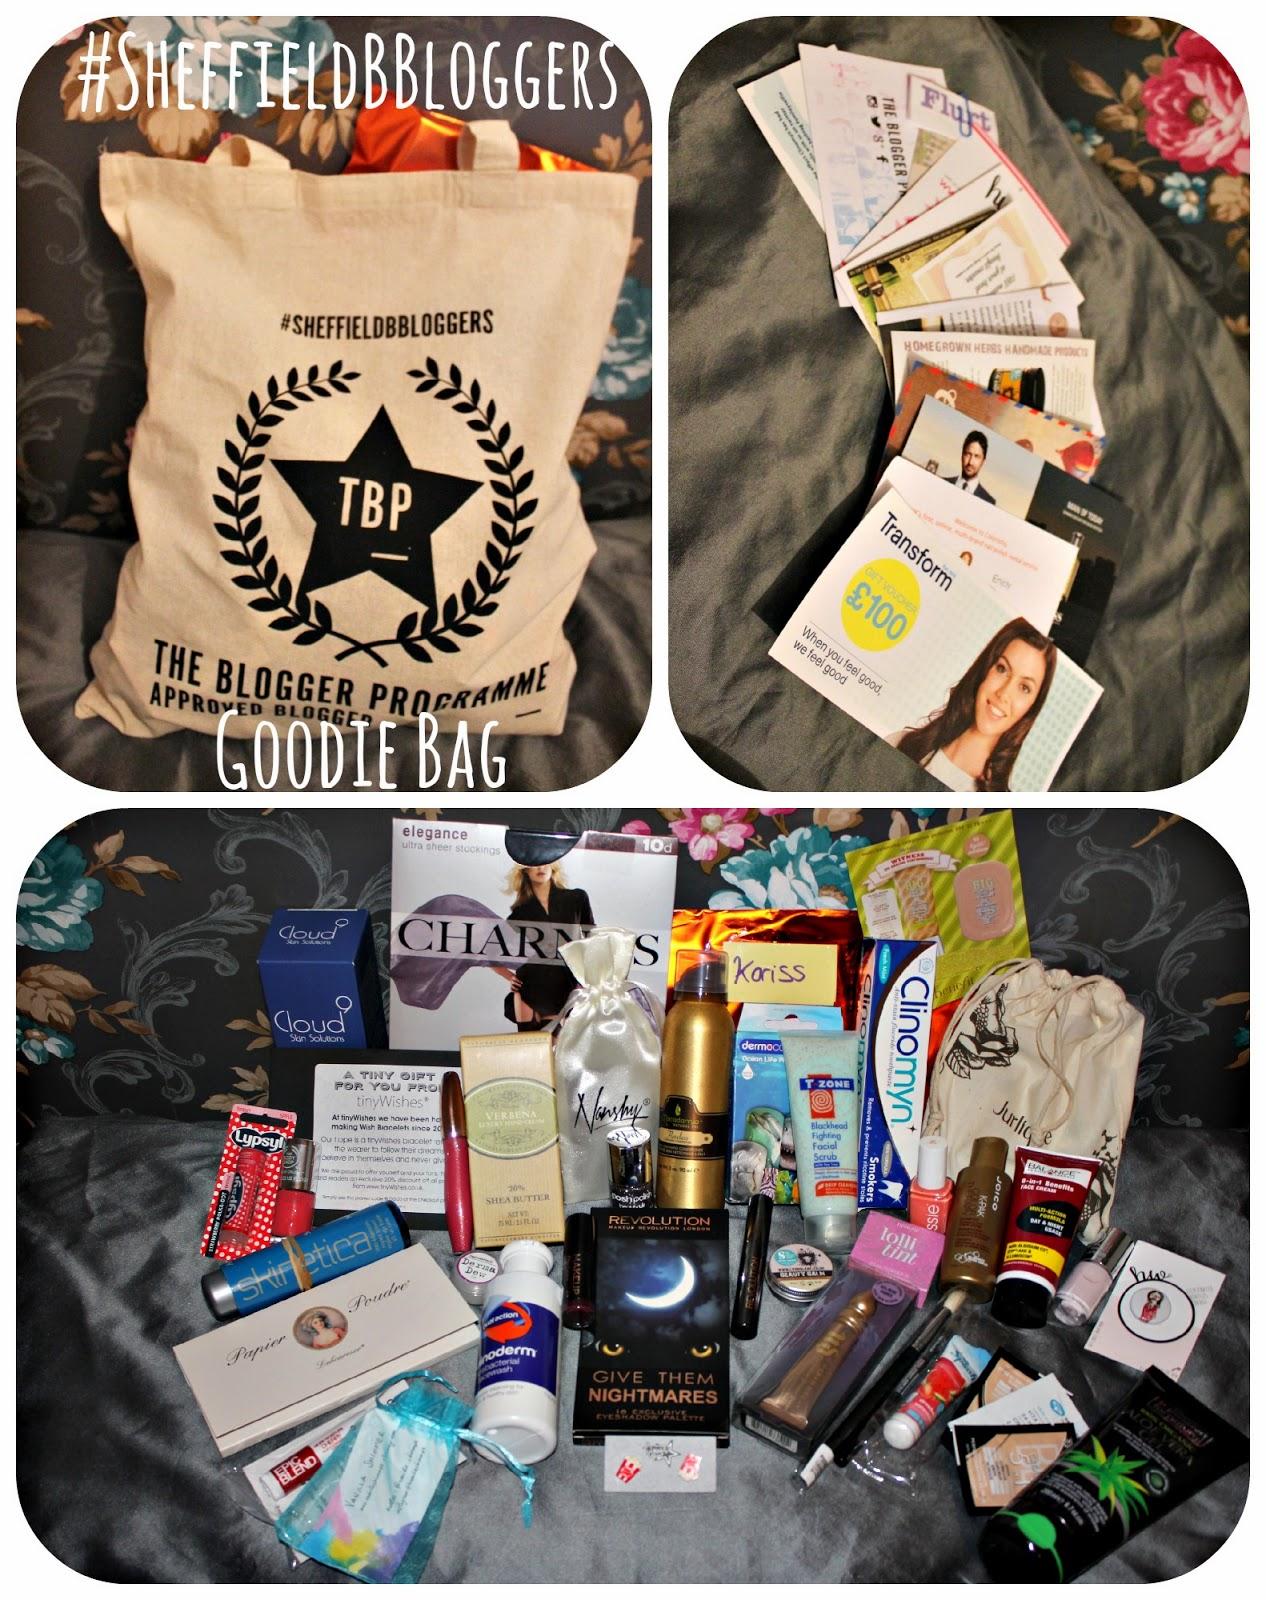 #SheffieldBBloggers Goodiebag